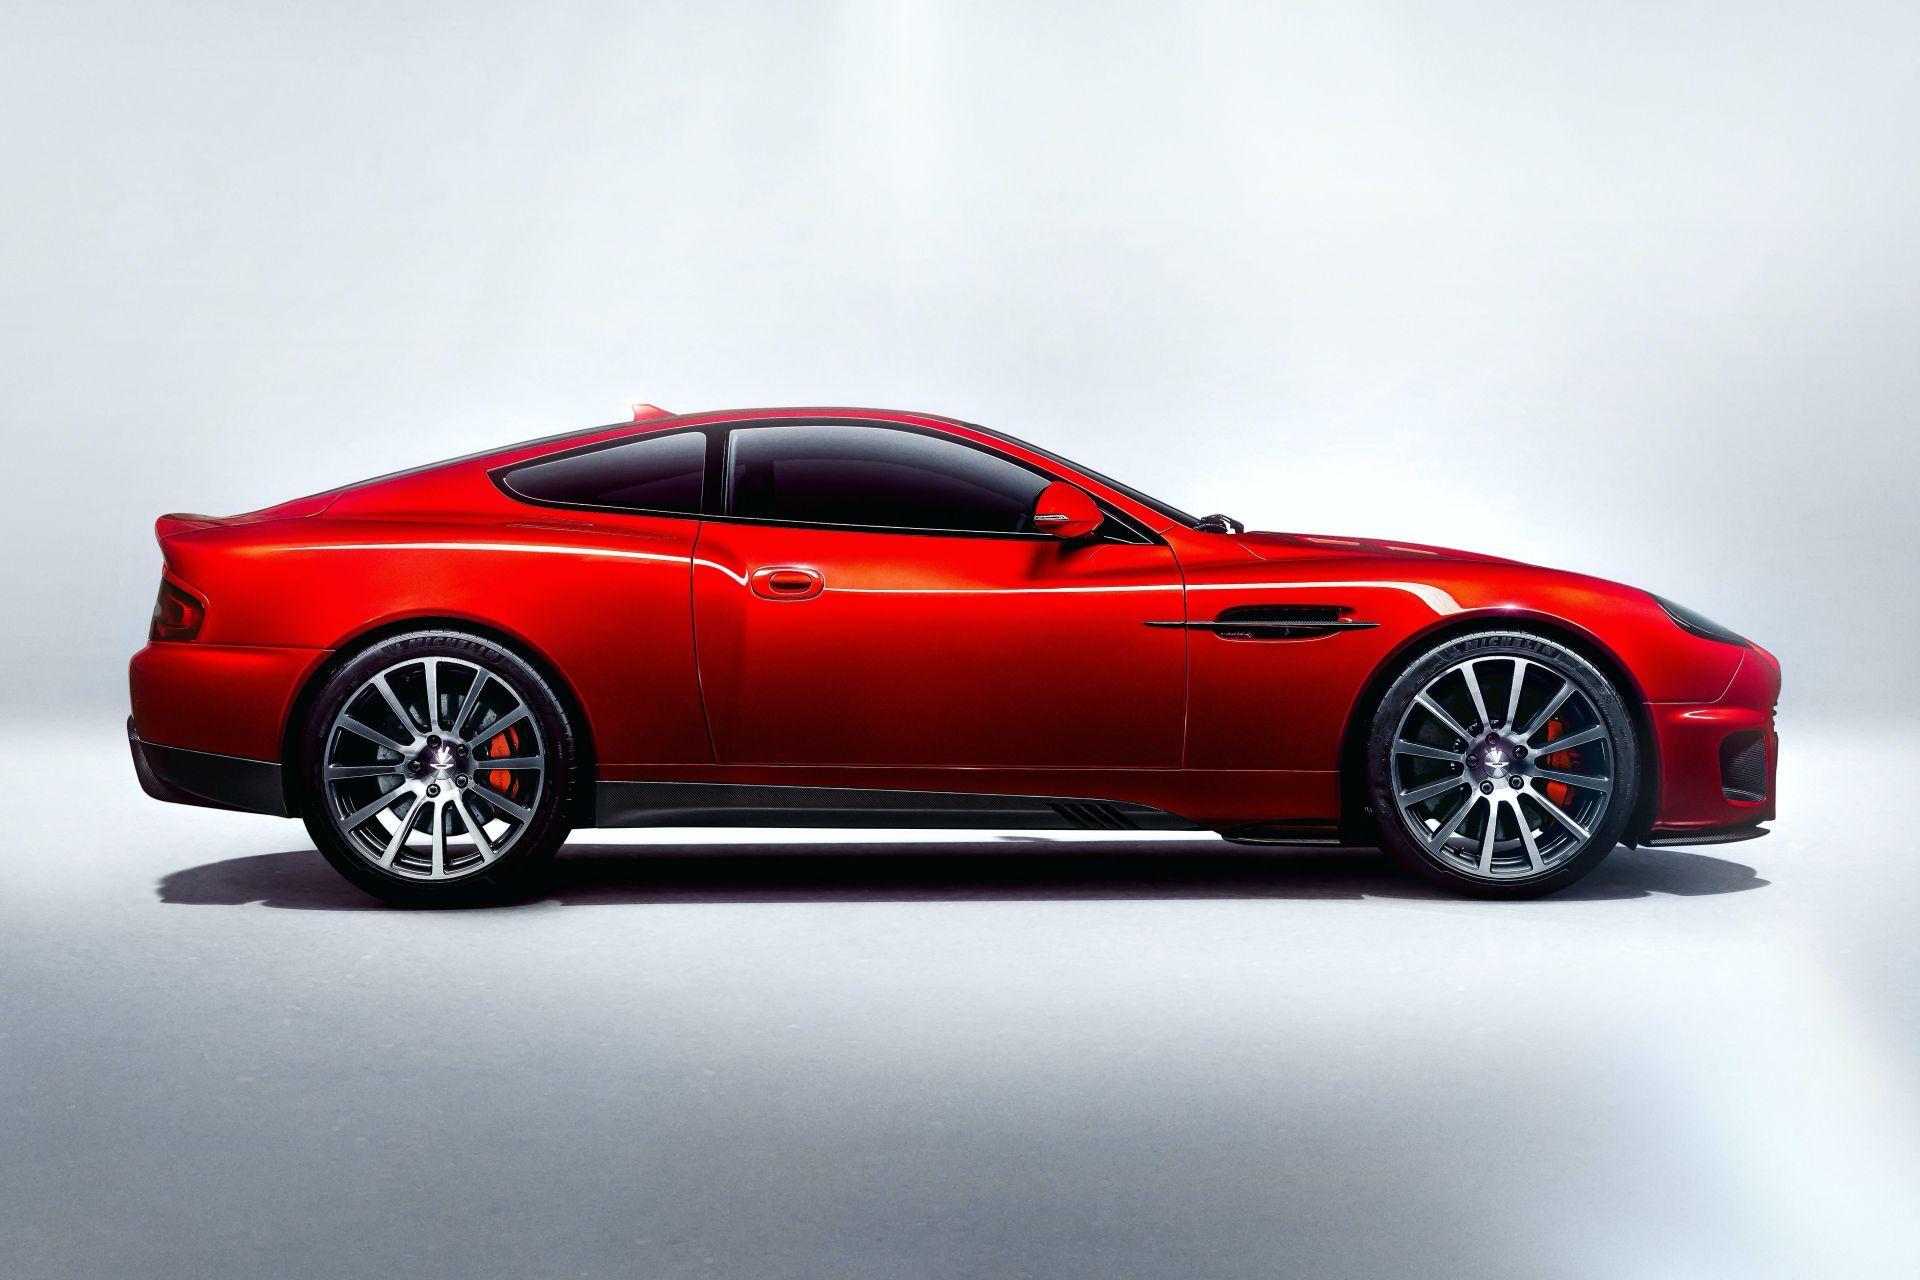 Aston-Martin-Callum-Vanquish-25-By-R-Reforged-9